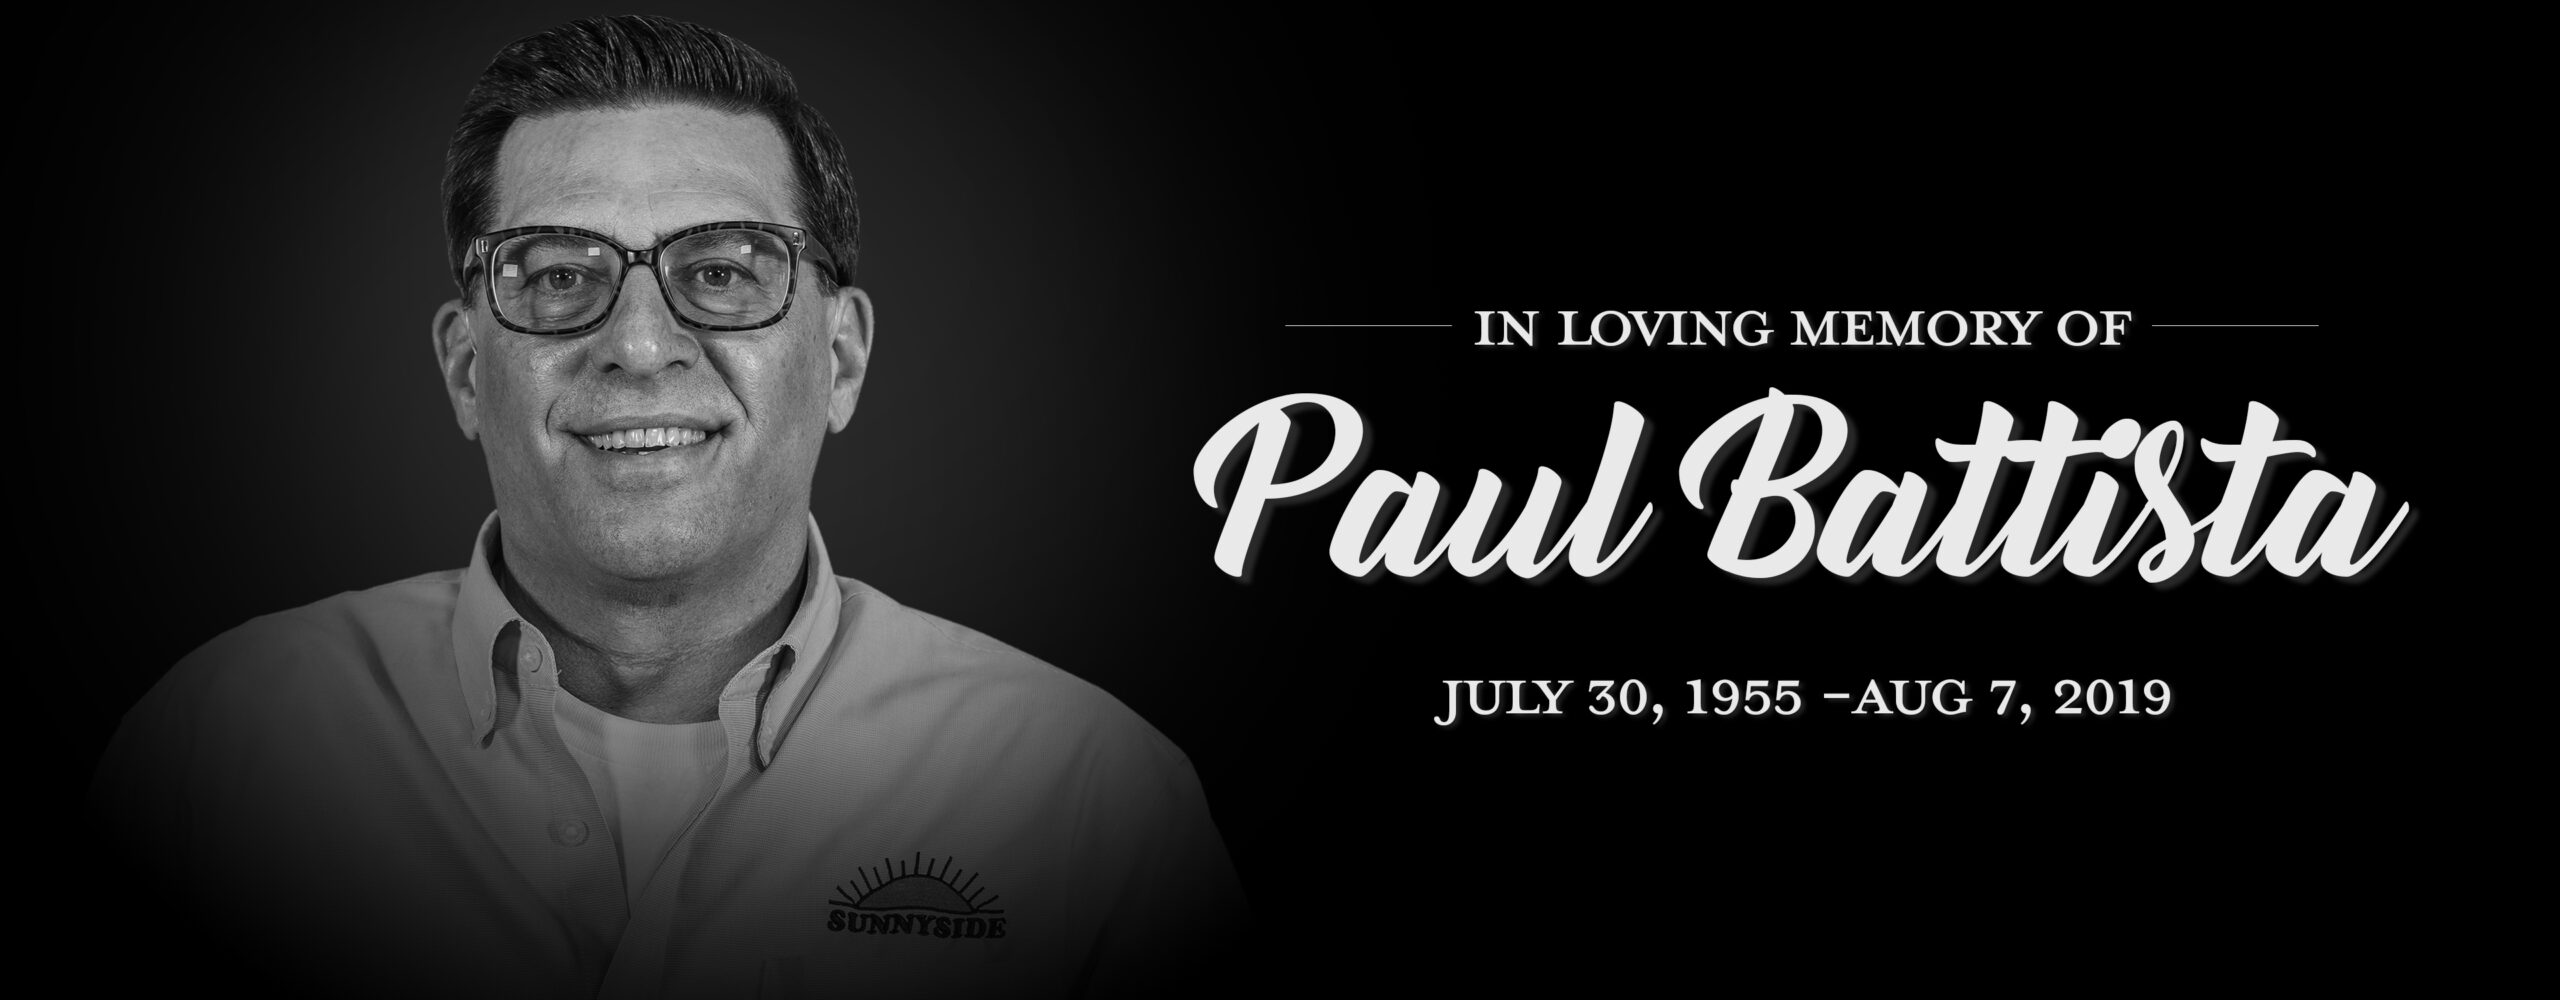 In Loving Memory of Paul Battista